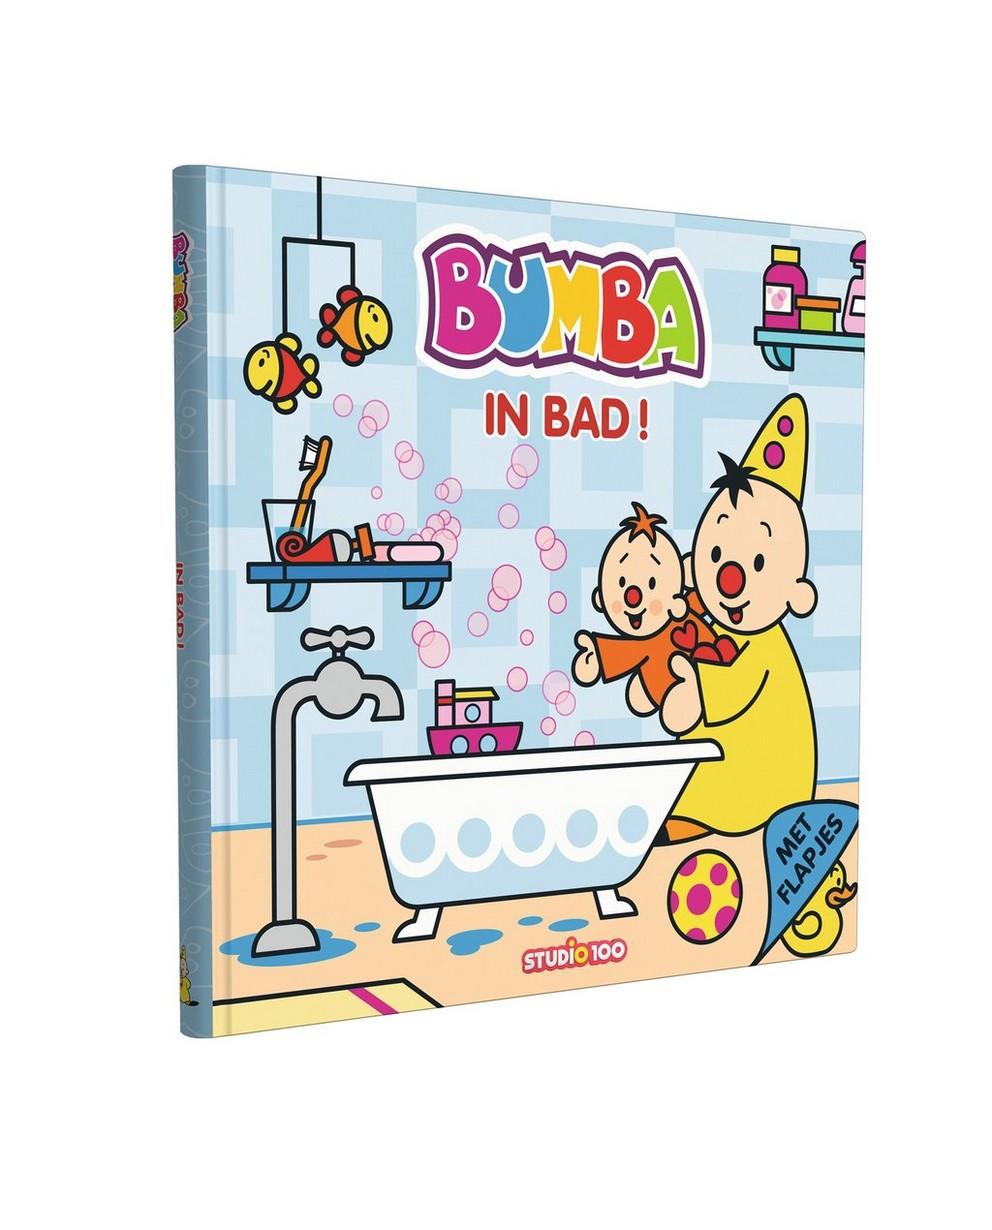 Bumba livre: Dans le bain - avec rabats - Bumba